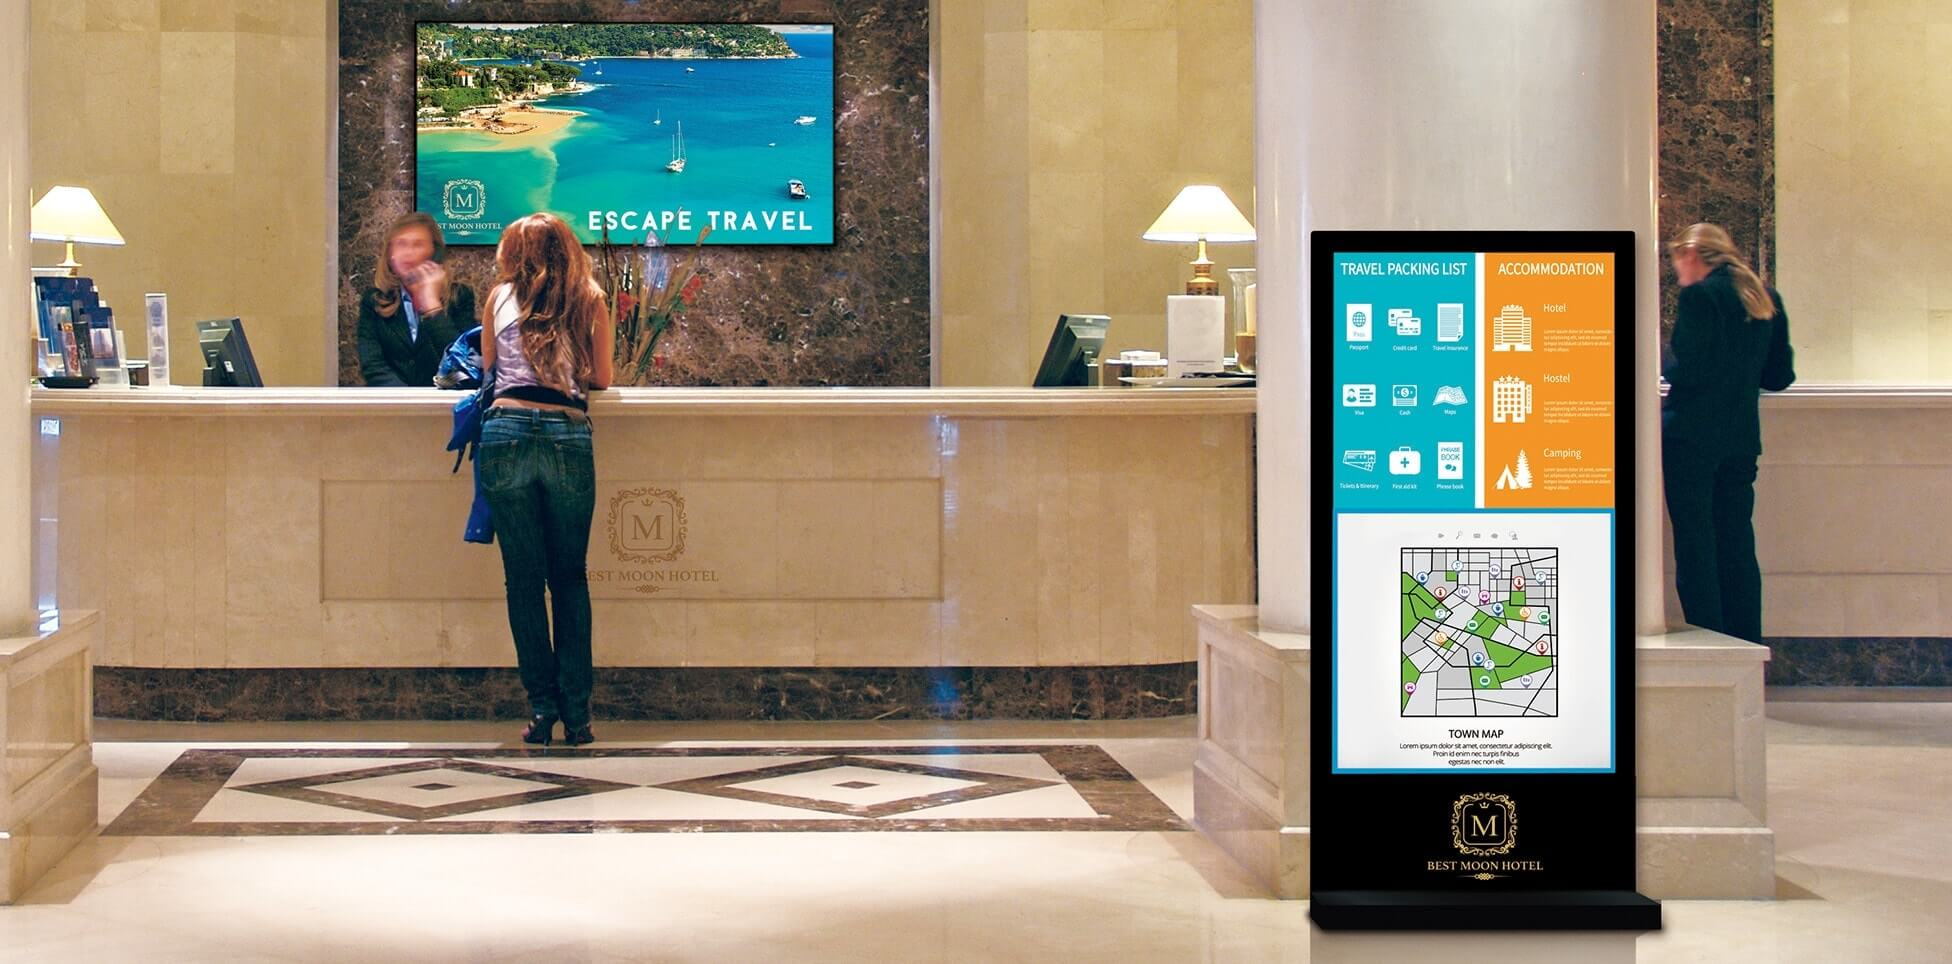 Quand la transformation digitale s'invite à l'hôtel